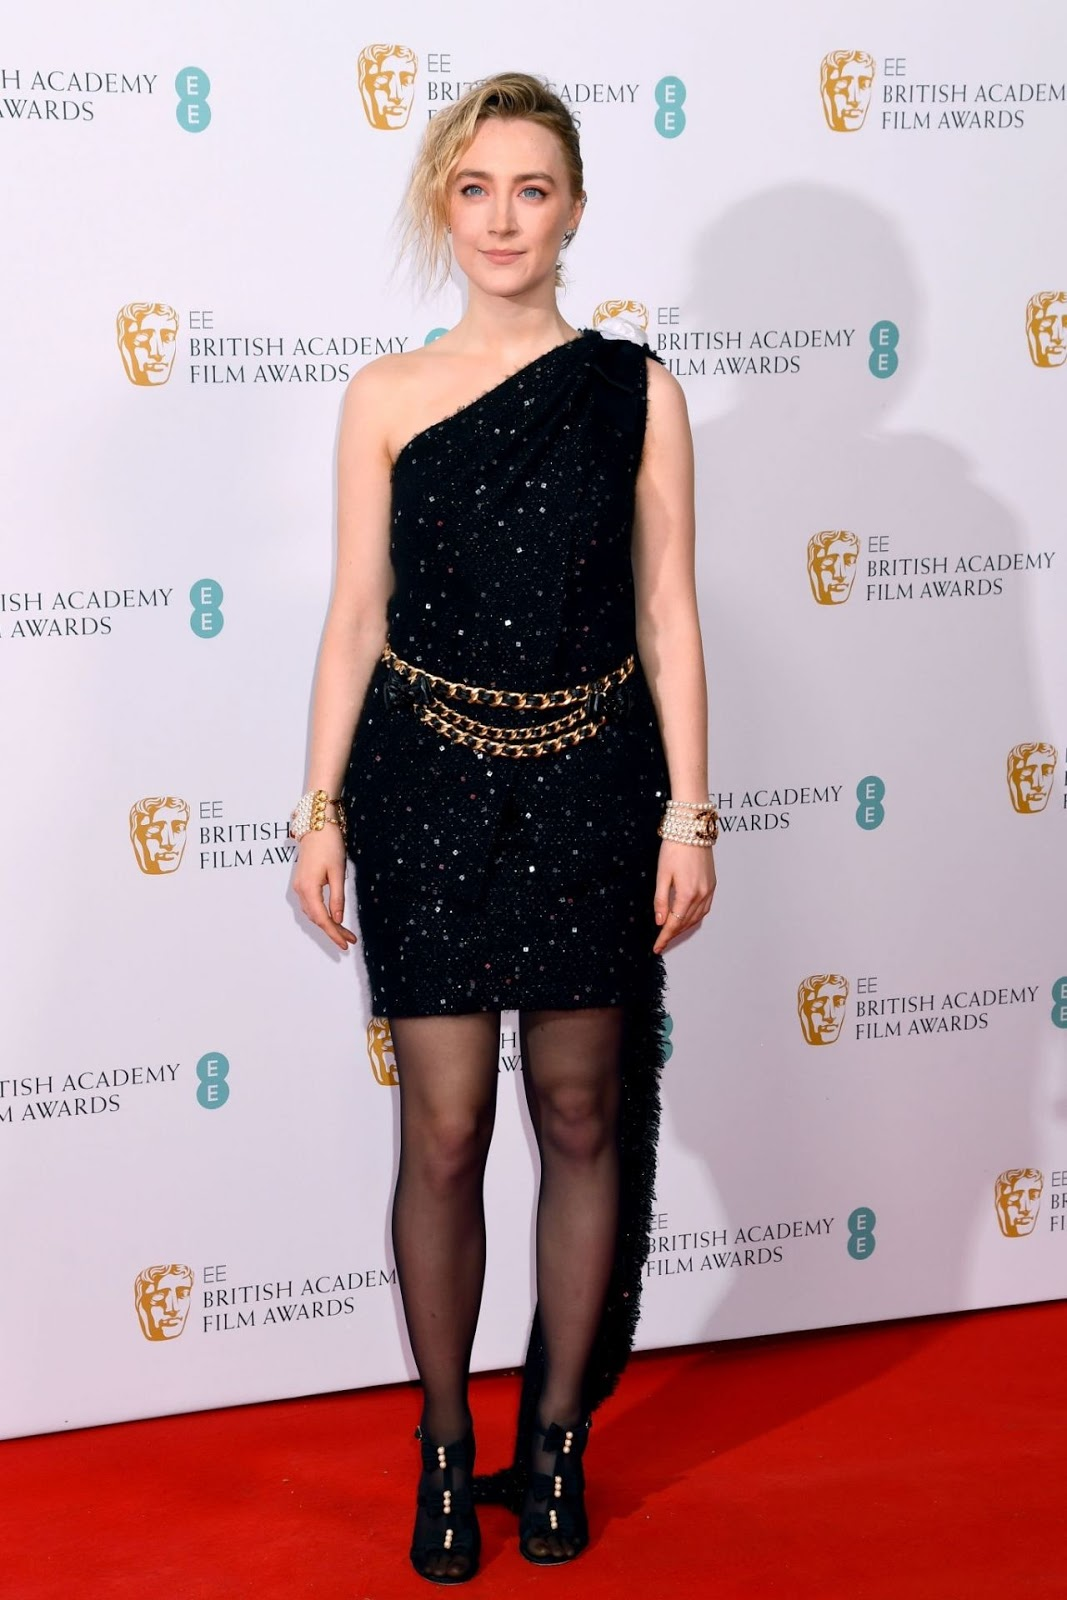 Saoirse Ronan - EE British Academy Film Awards 2020 Nominees' Party in London